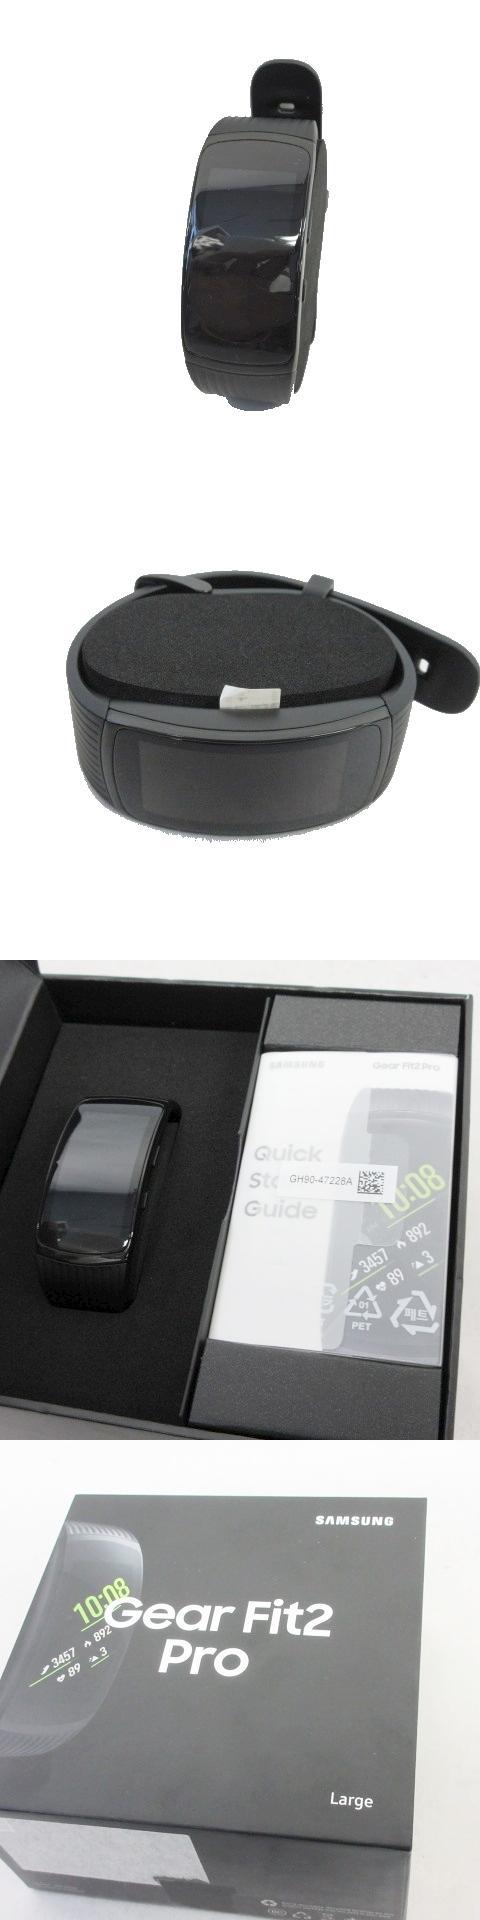 SAMSUNG/サムスン Galaxy Gear Fit2 Pro Large SM-R365 スマートバンド フィットネスバンド 黒 ブラック